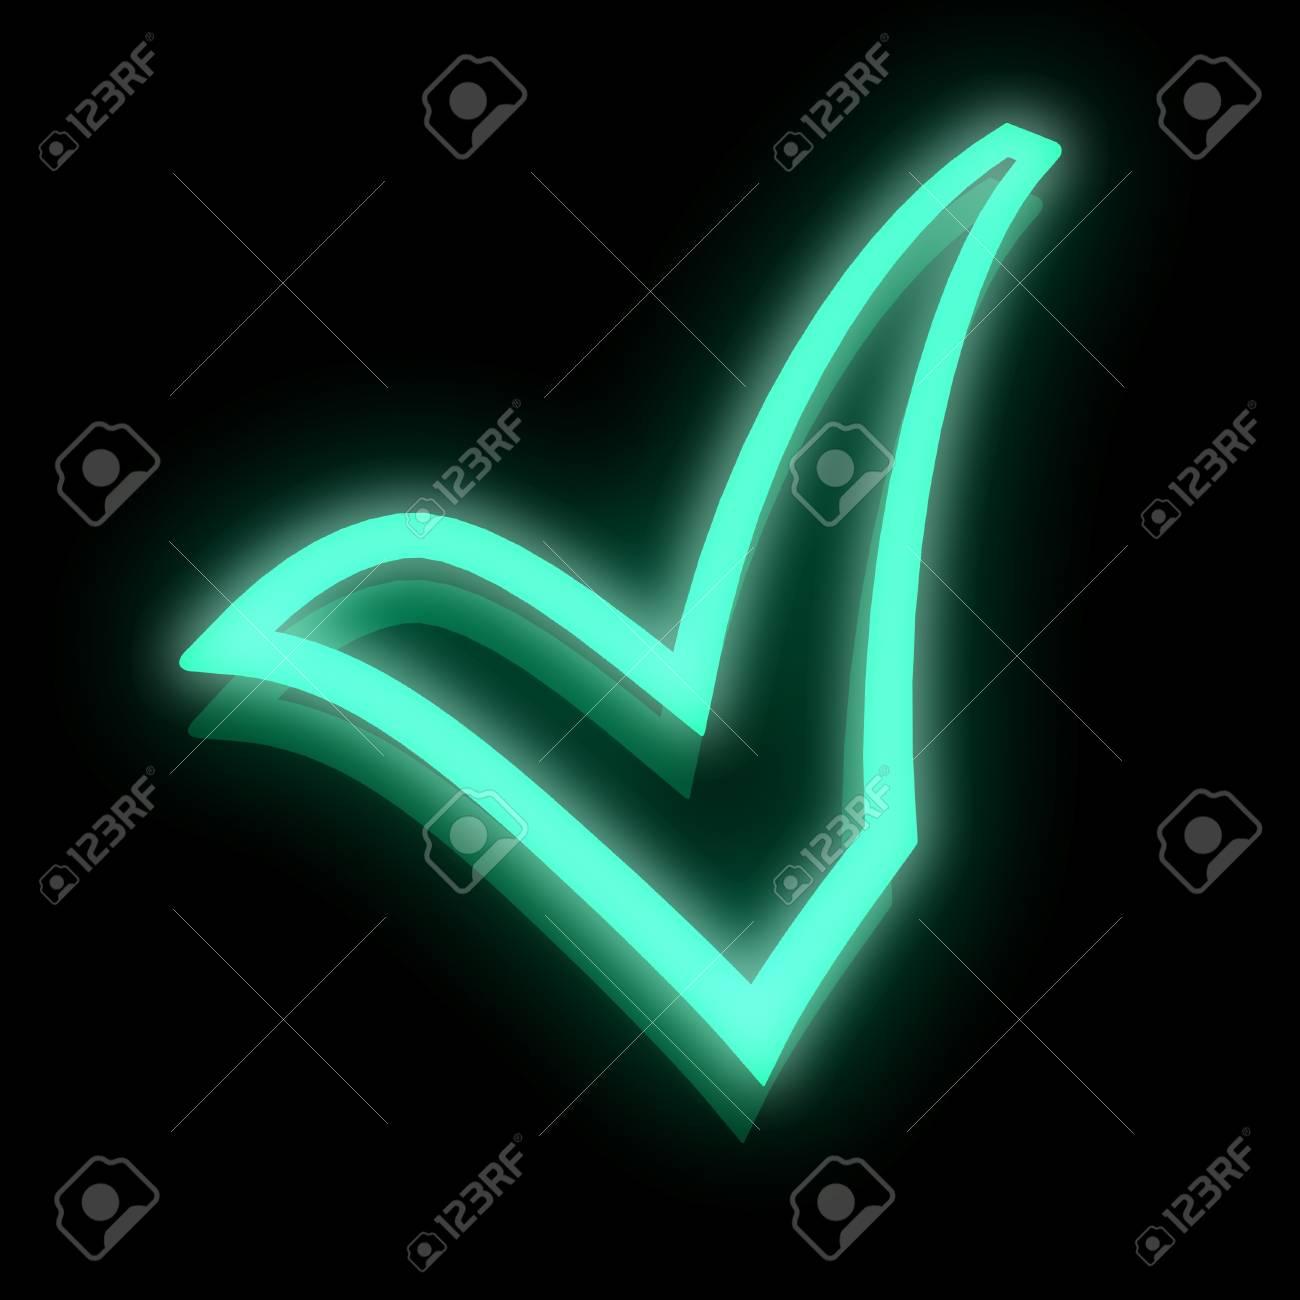 3D neon abstract check mark Stock Photo - 18337376